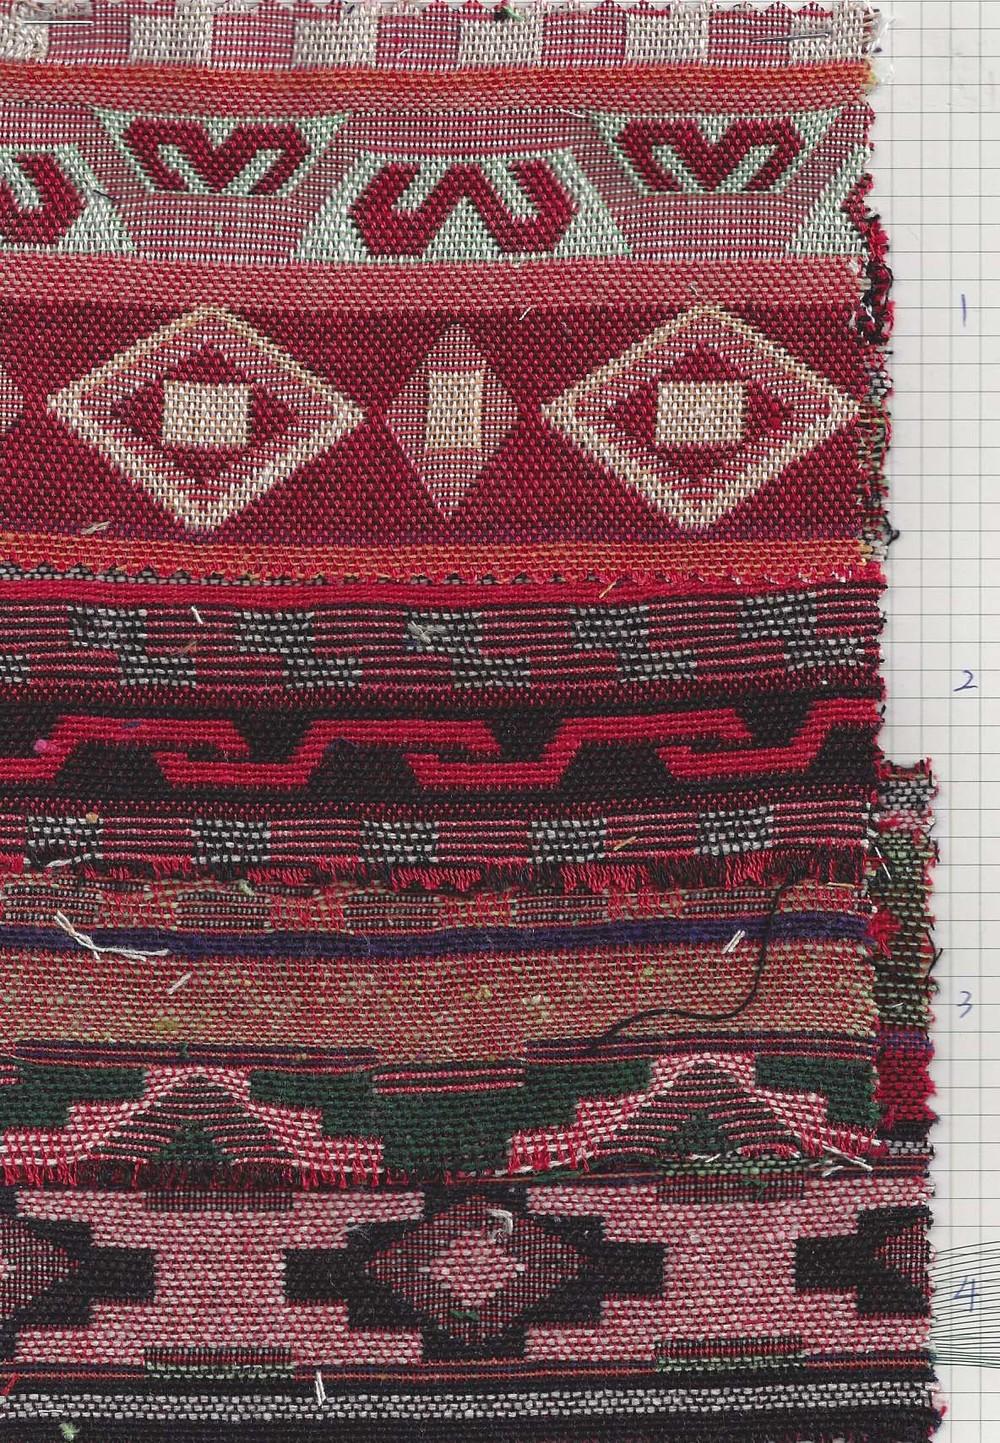 Textile Da Yuan S045.jpg